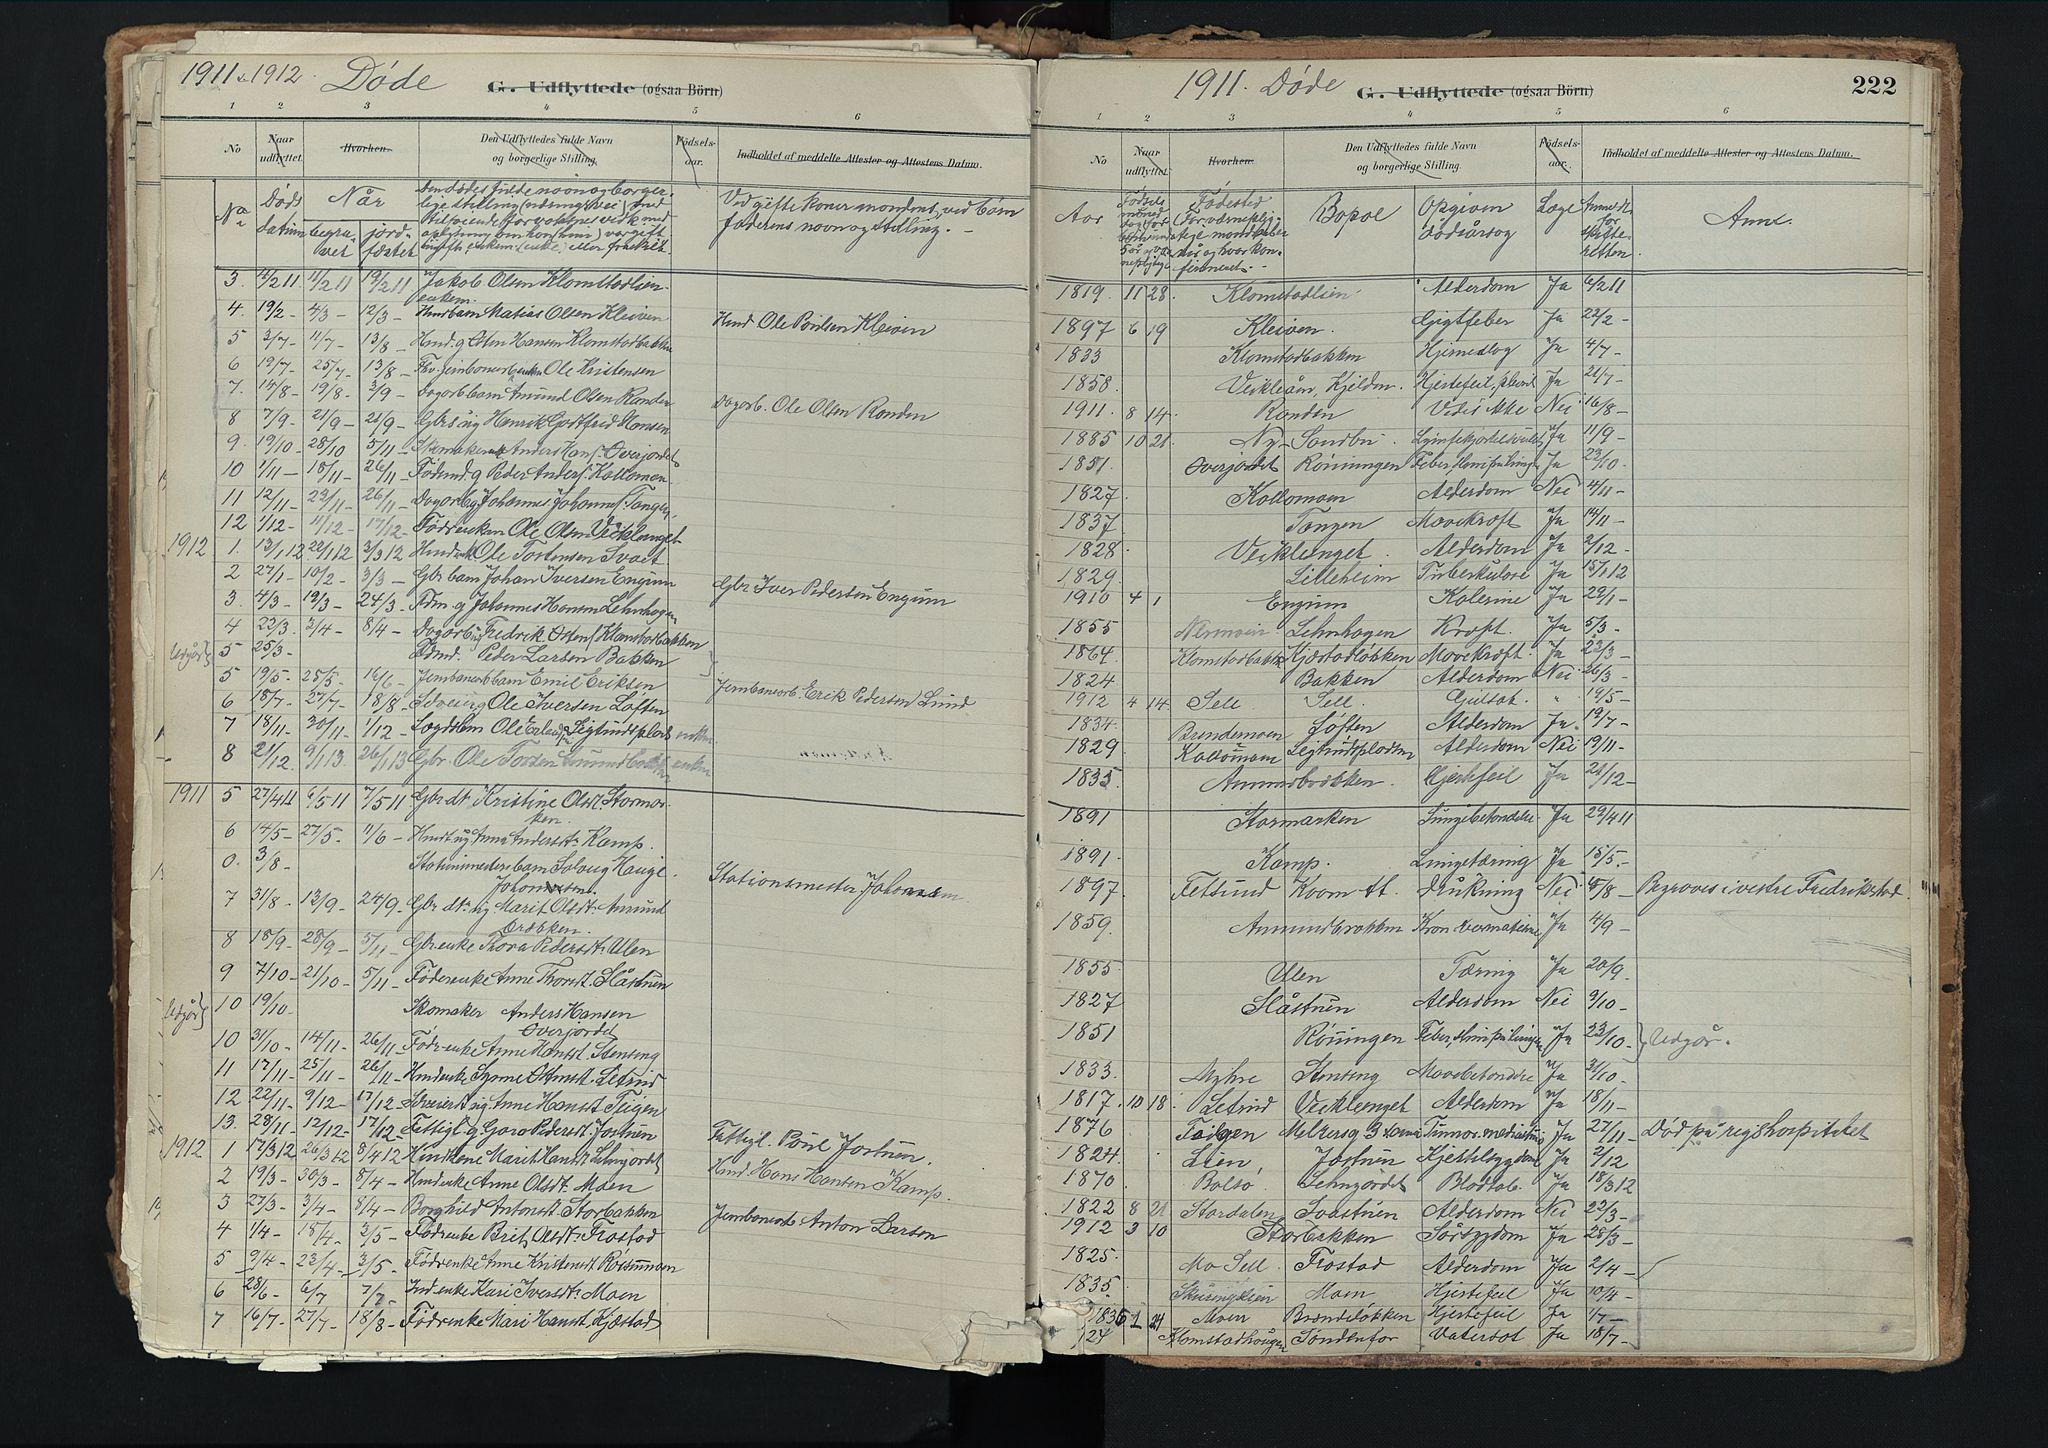 SAH, Nord-Fron prestekontor, Ministerialbok nr. 3, 1884-1914, s. 222